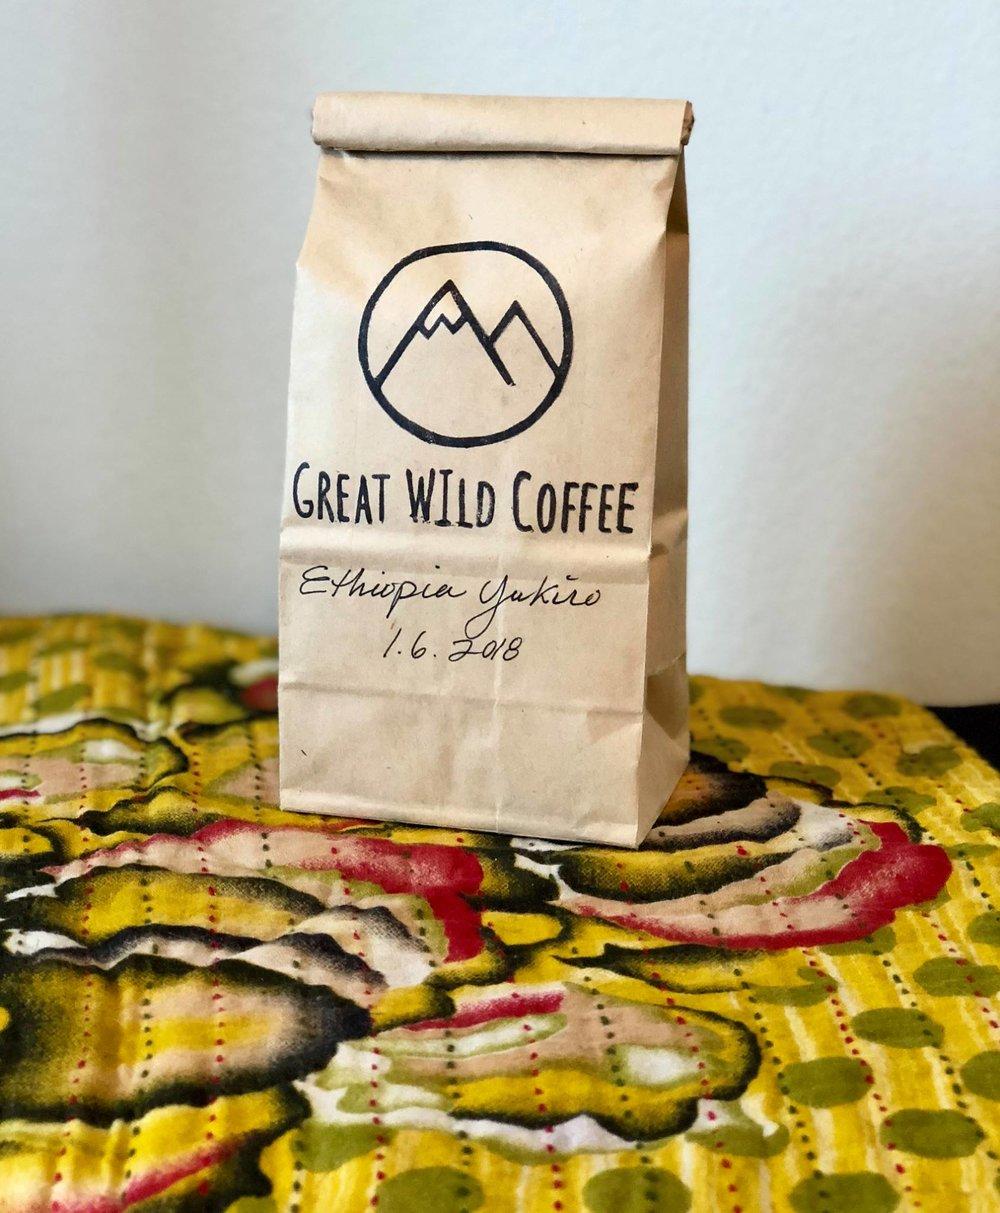 GreatWildCoffee-Ethiopia-CoffeeBeans.jpg